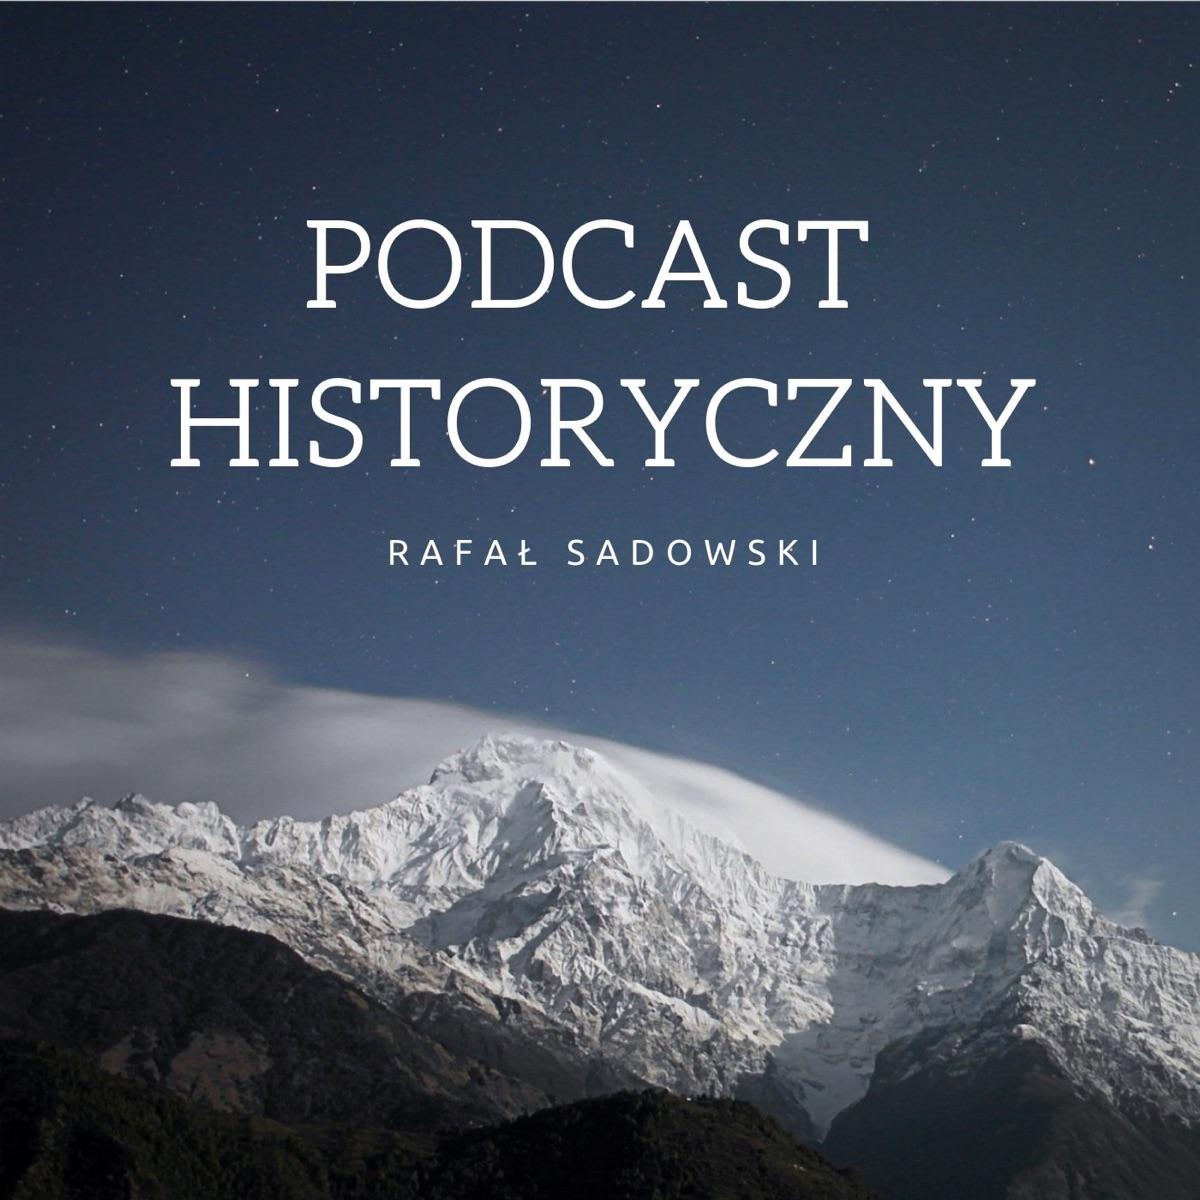 Podcast Historyczny